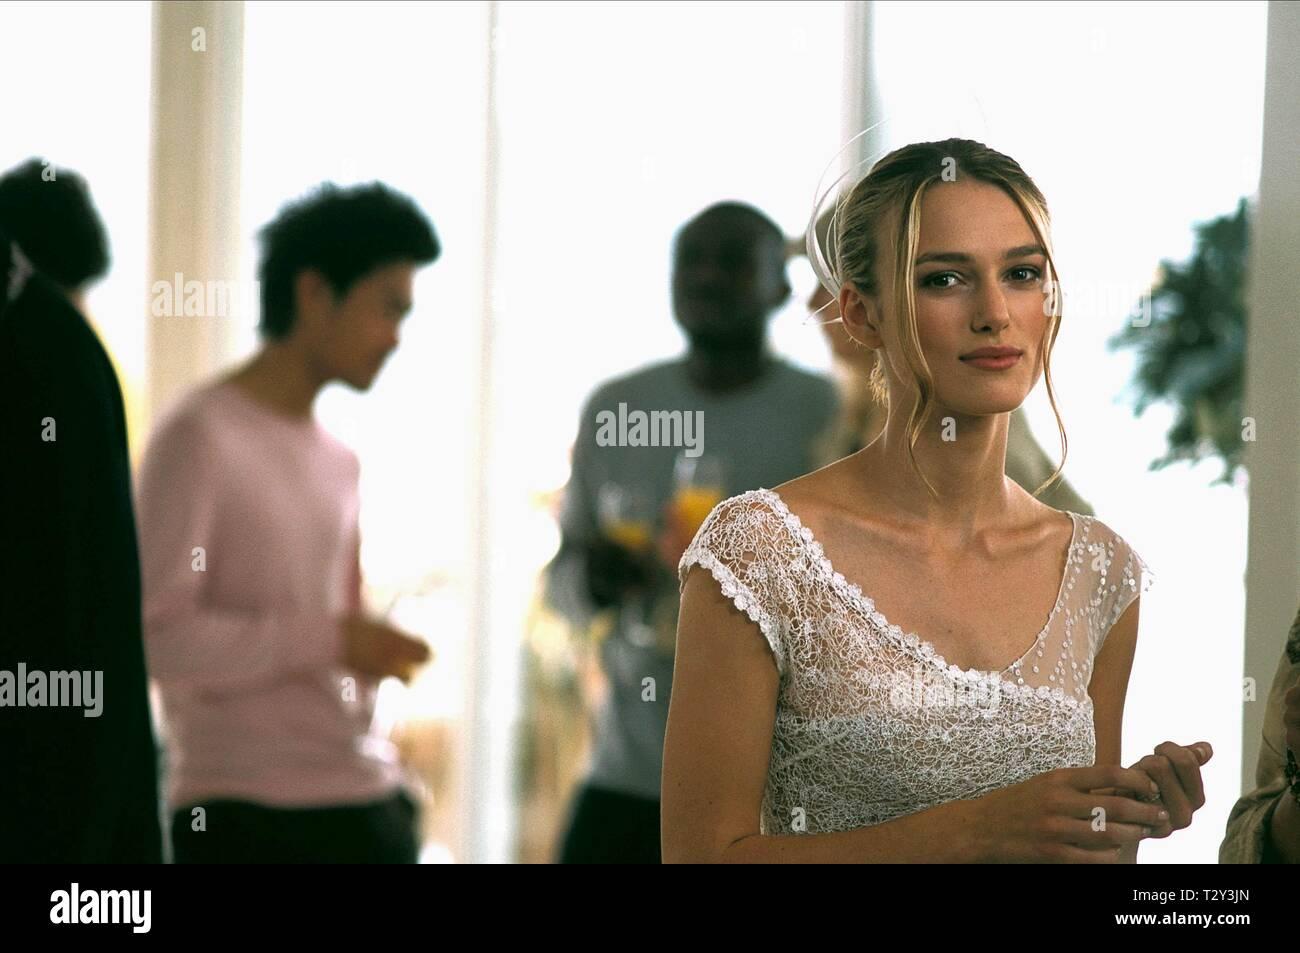 Keira Knightley Love Actually 2003 Stock Photo Alamy